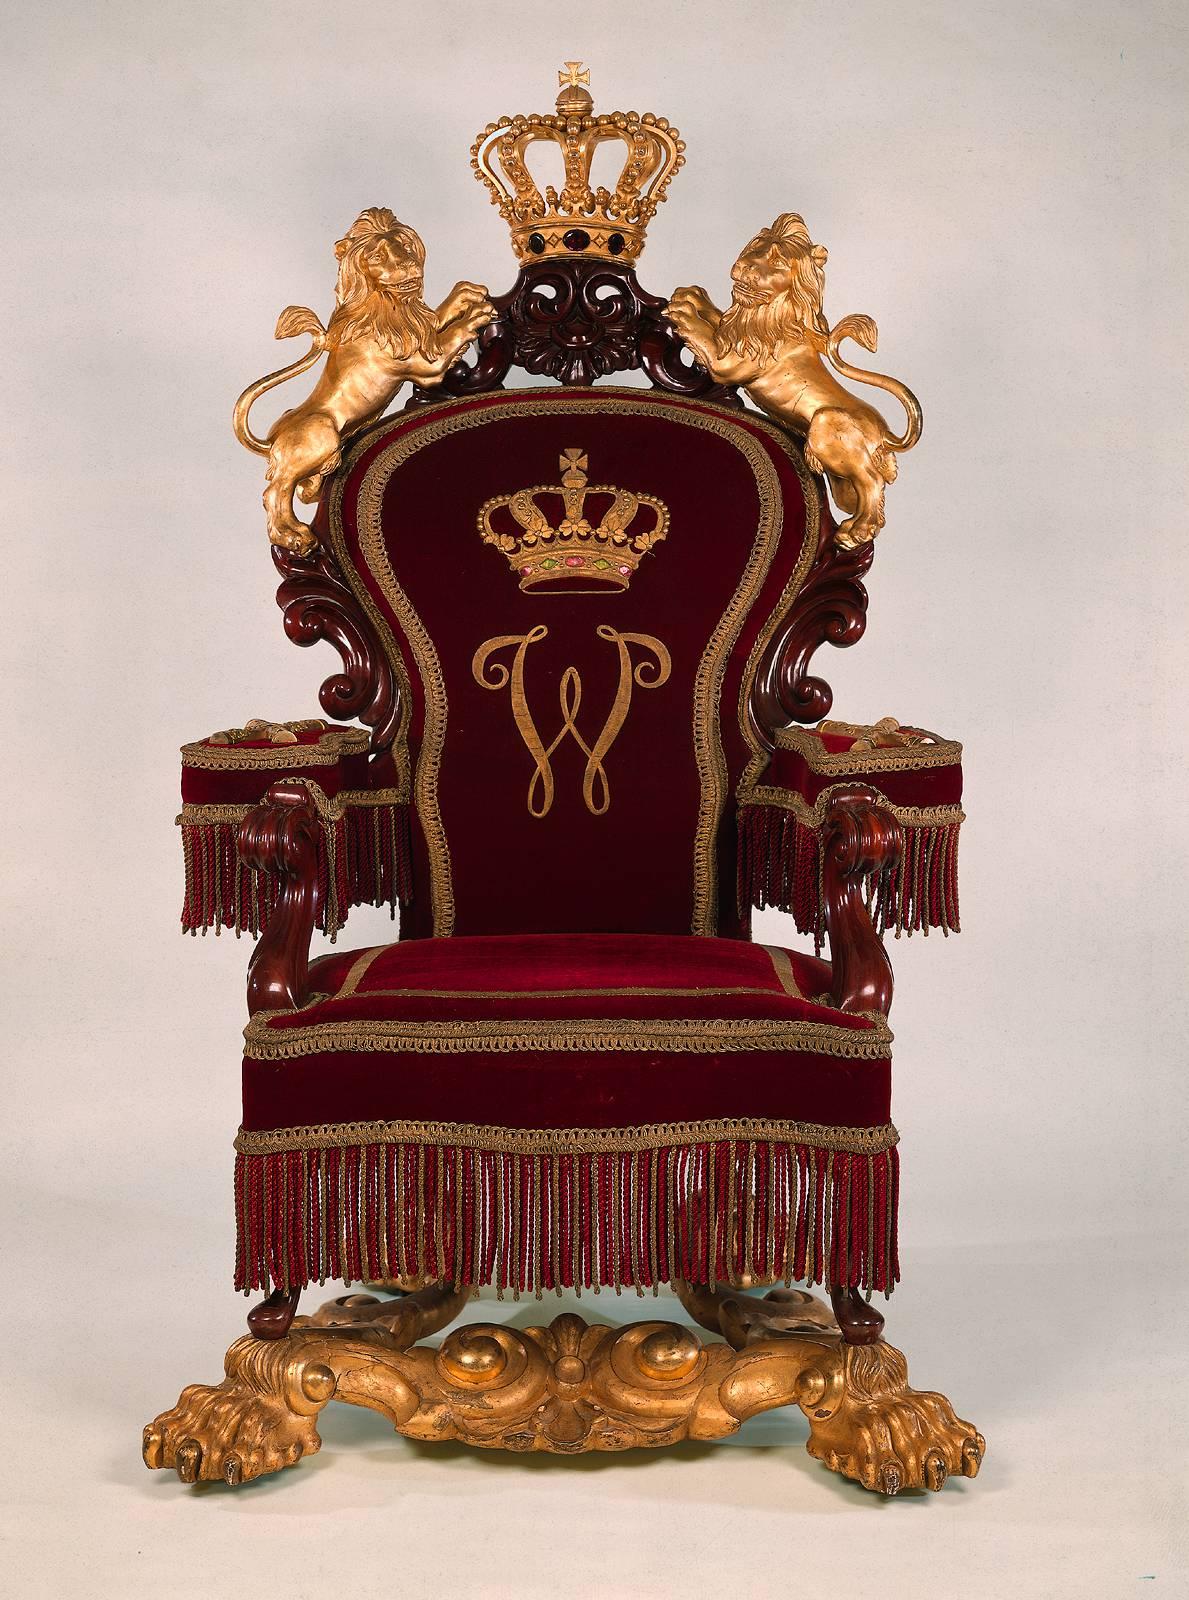 Кресло-трон с обивкой из бархата